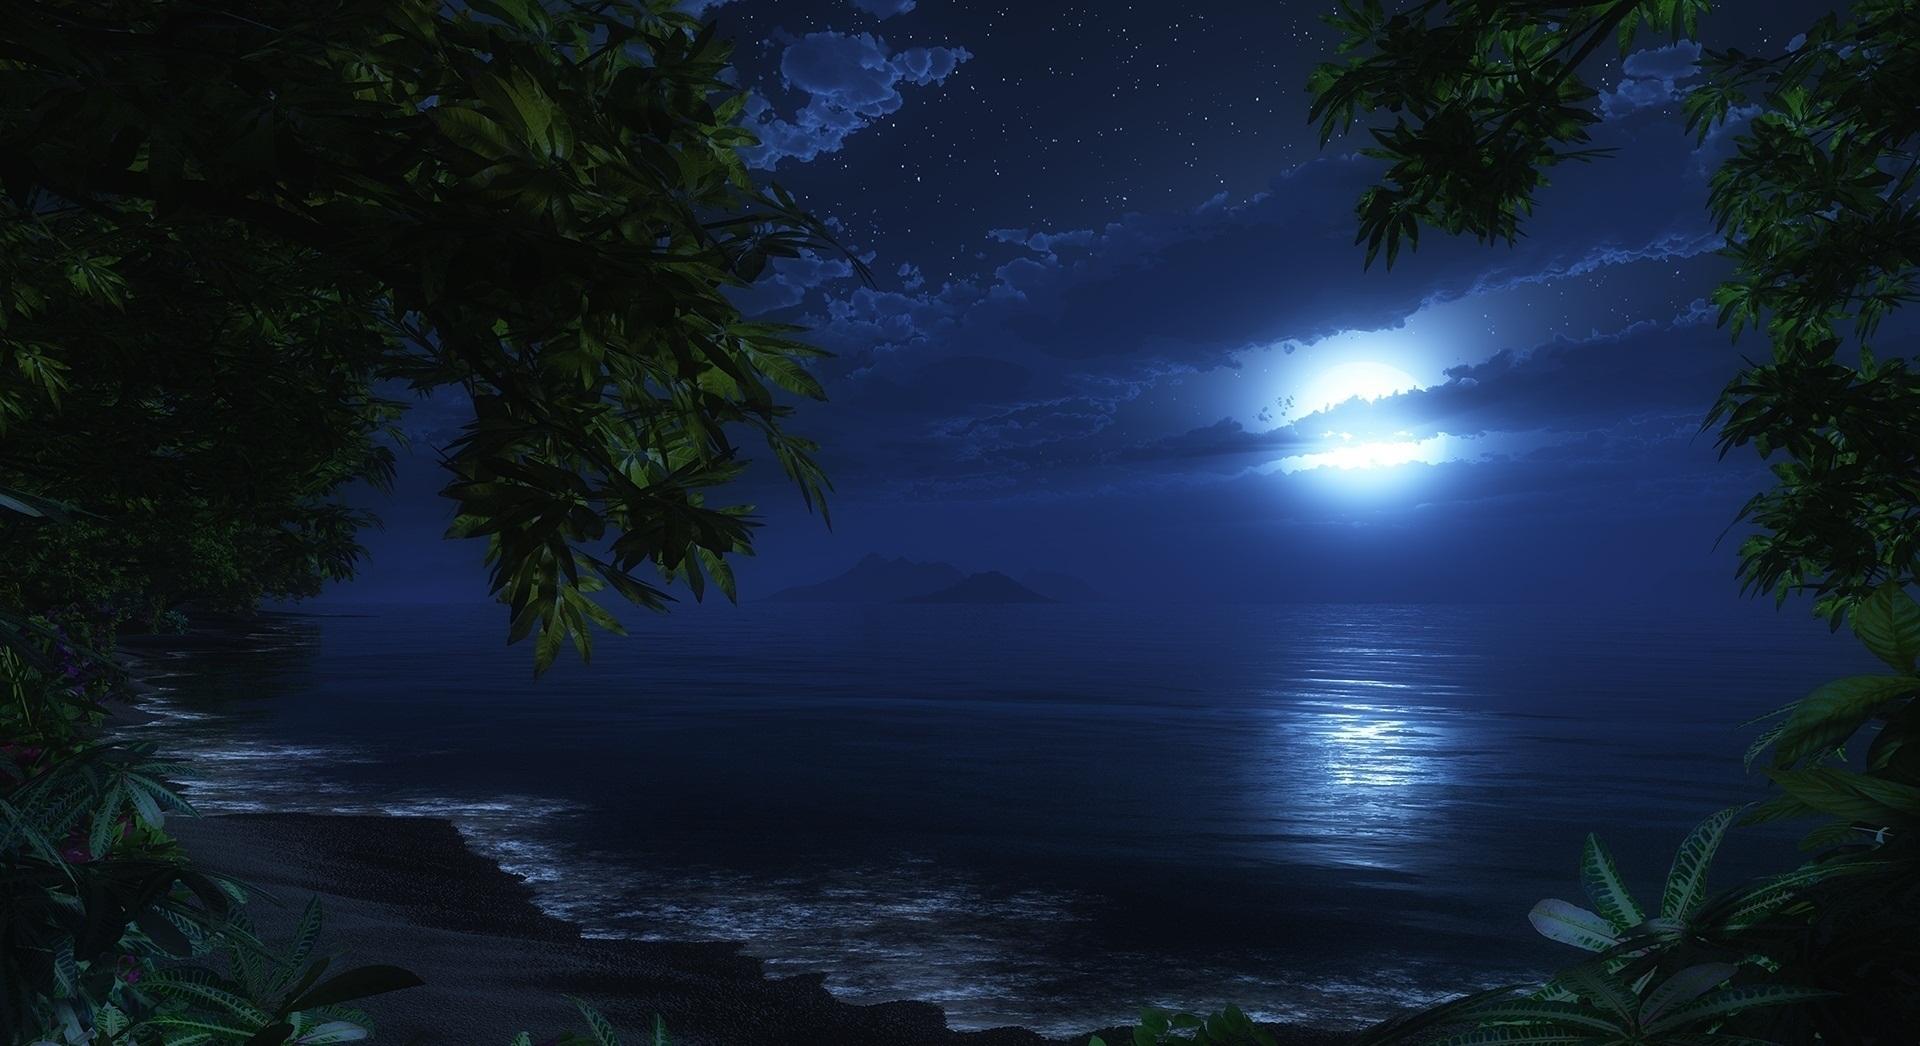 Sea night wallpaper